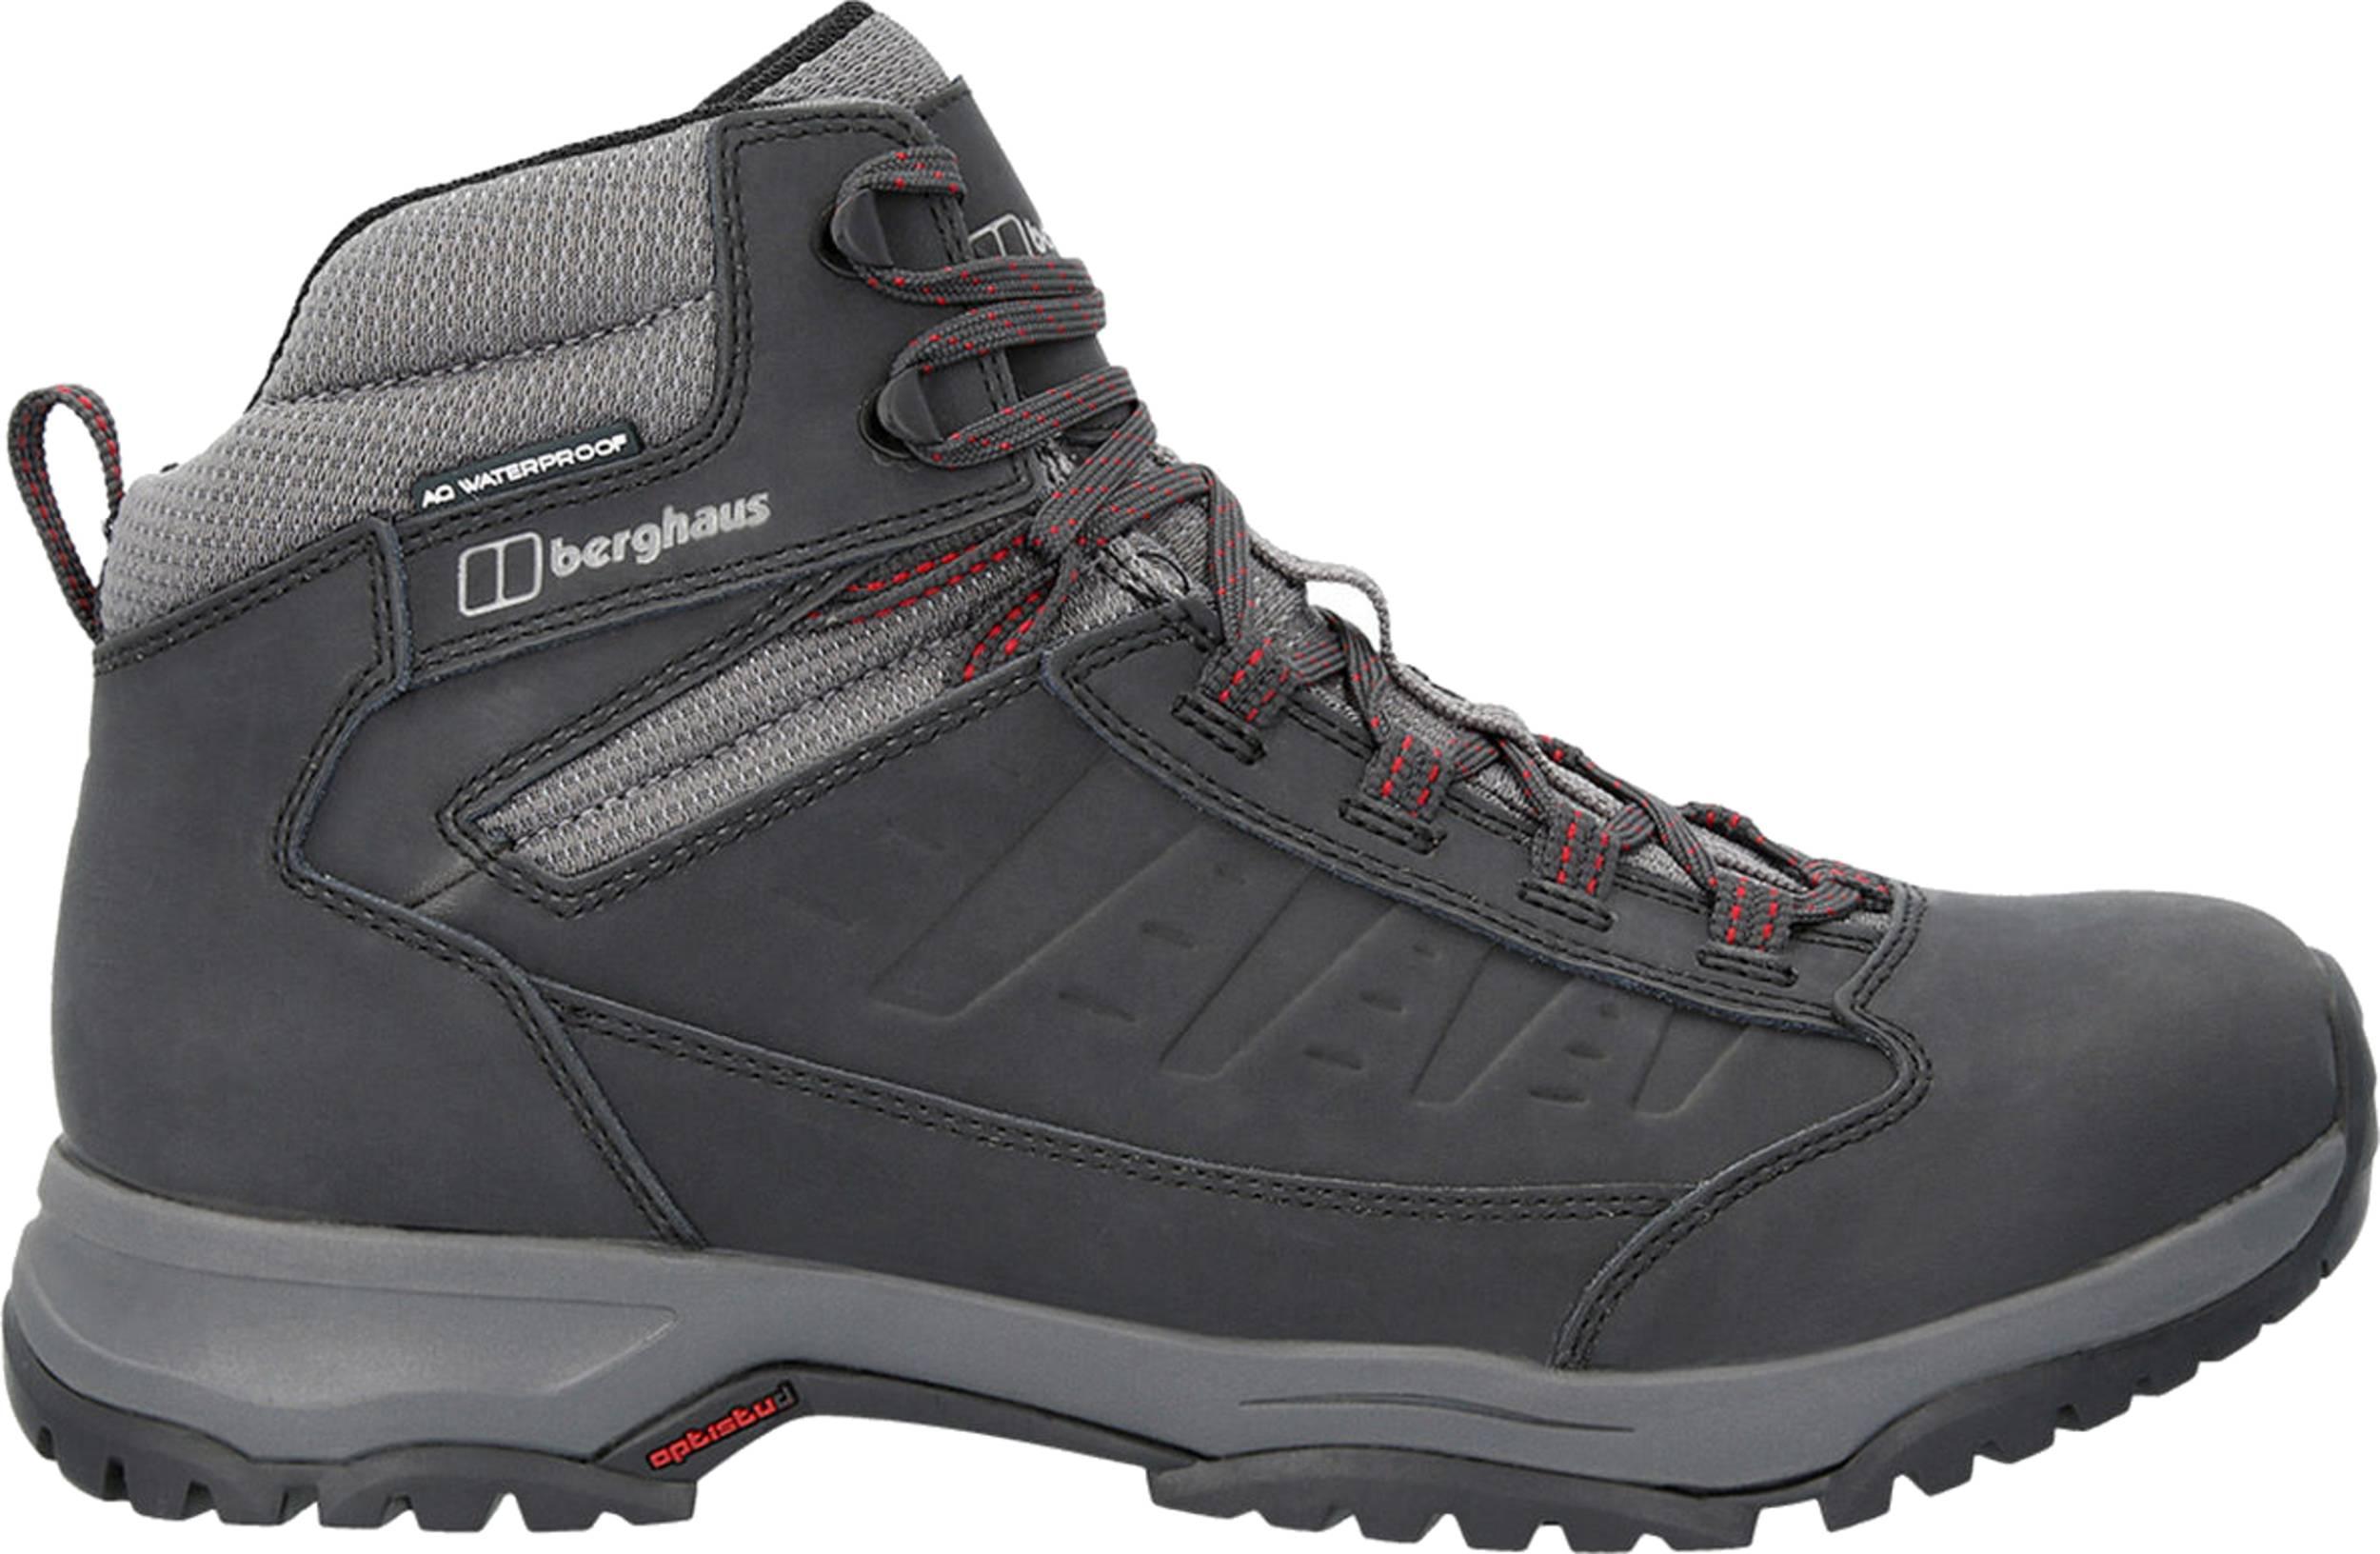 berghaus walking boots sale